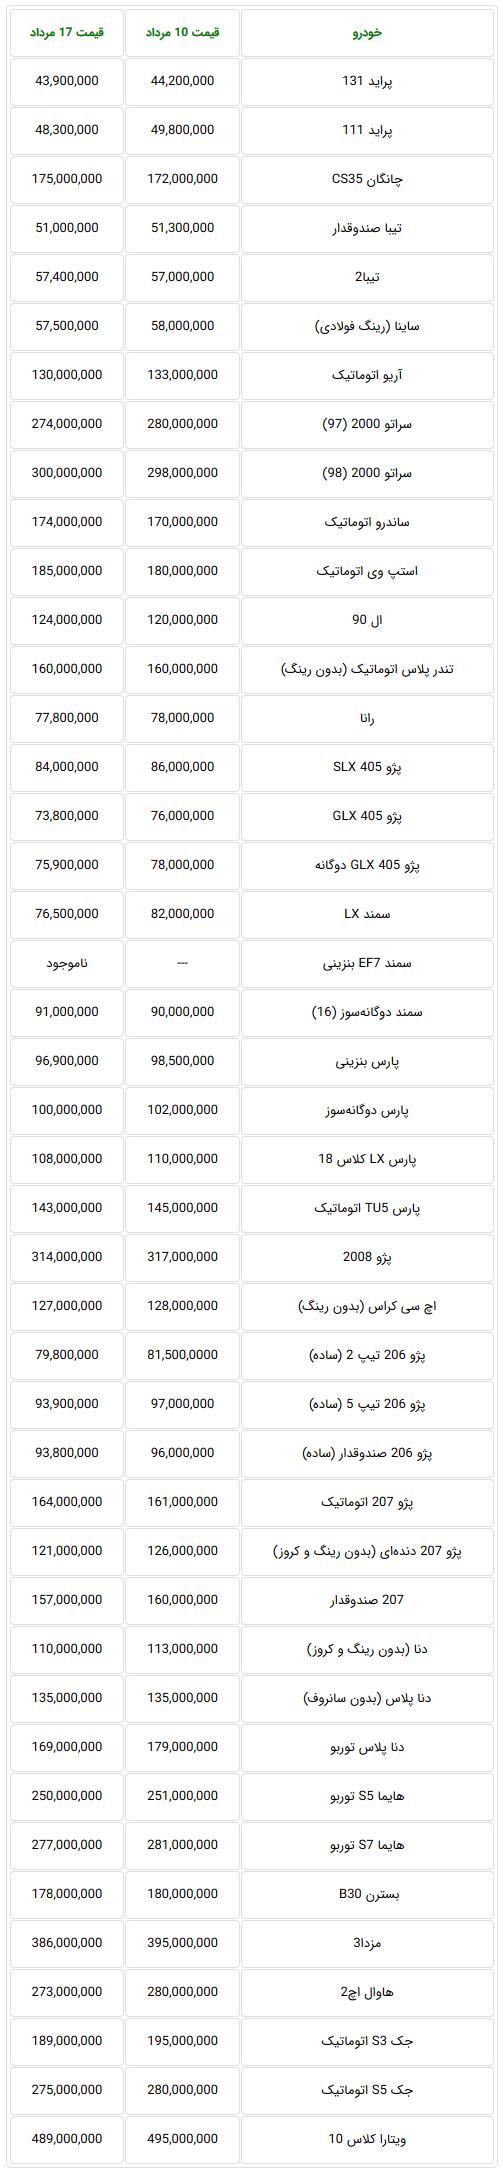 Screenshot_2019-08-10 جدیدترین قیمت خودروهای داخلی در بازار تهران.png